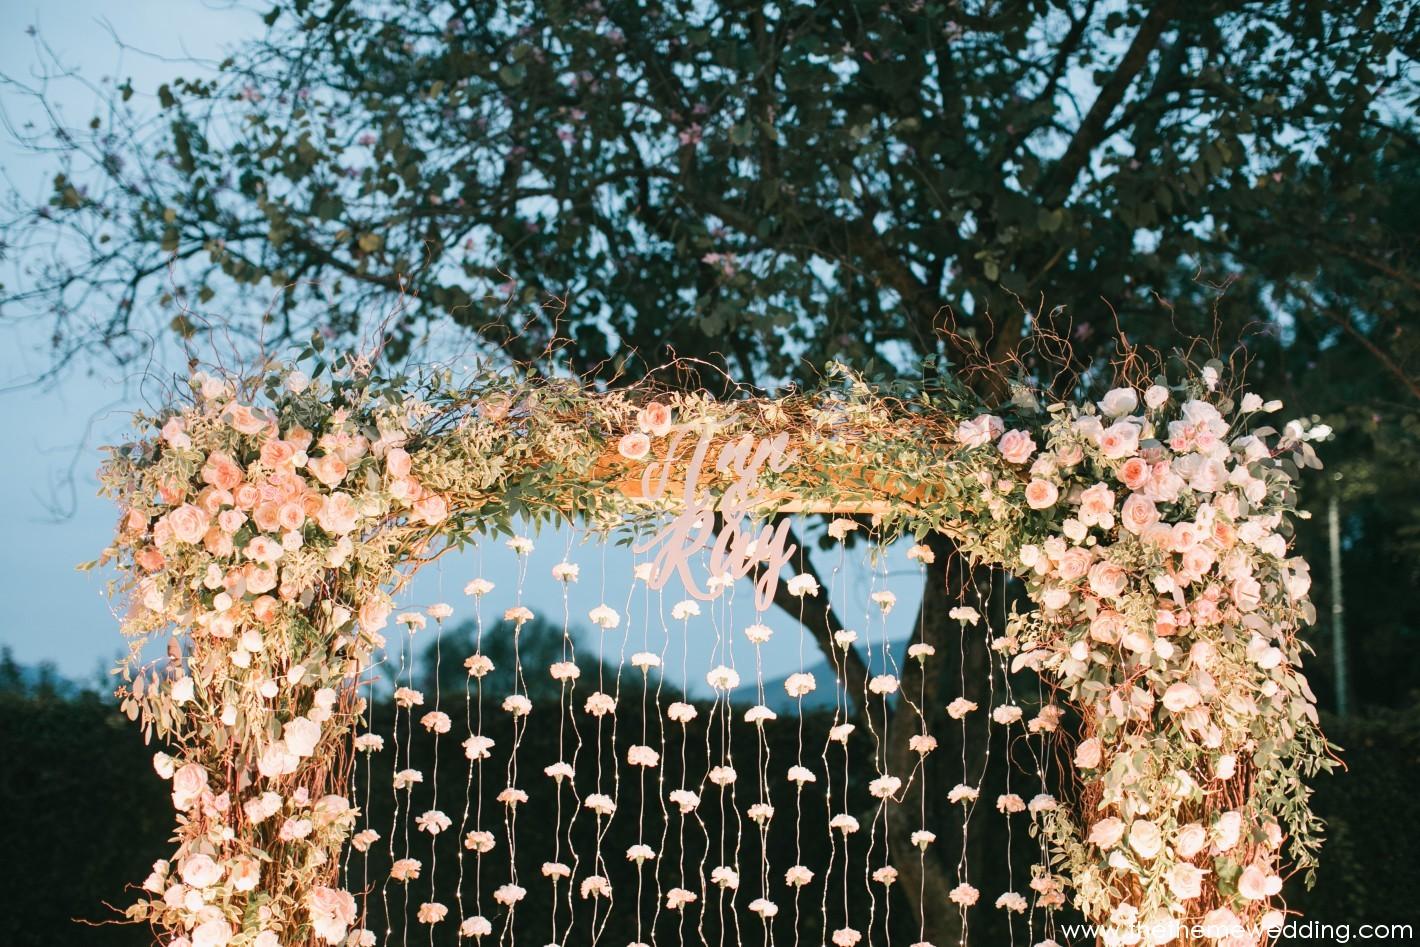 - For more, please visit www.thethemewedding.com